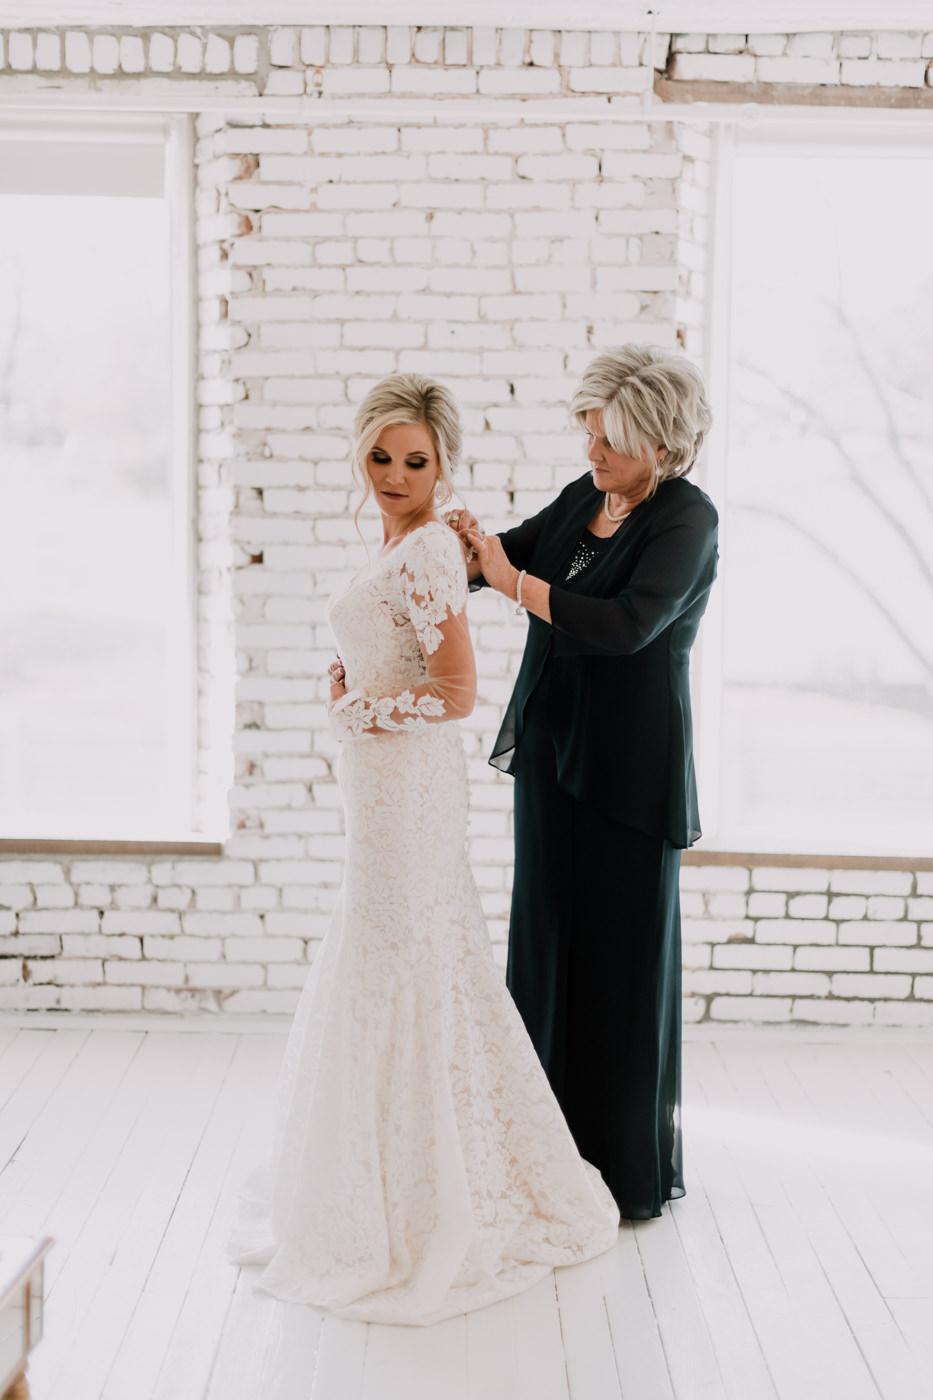 ravington.wedding.northwestarkansas.mileswittboyer-11.jpg